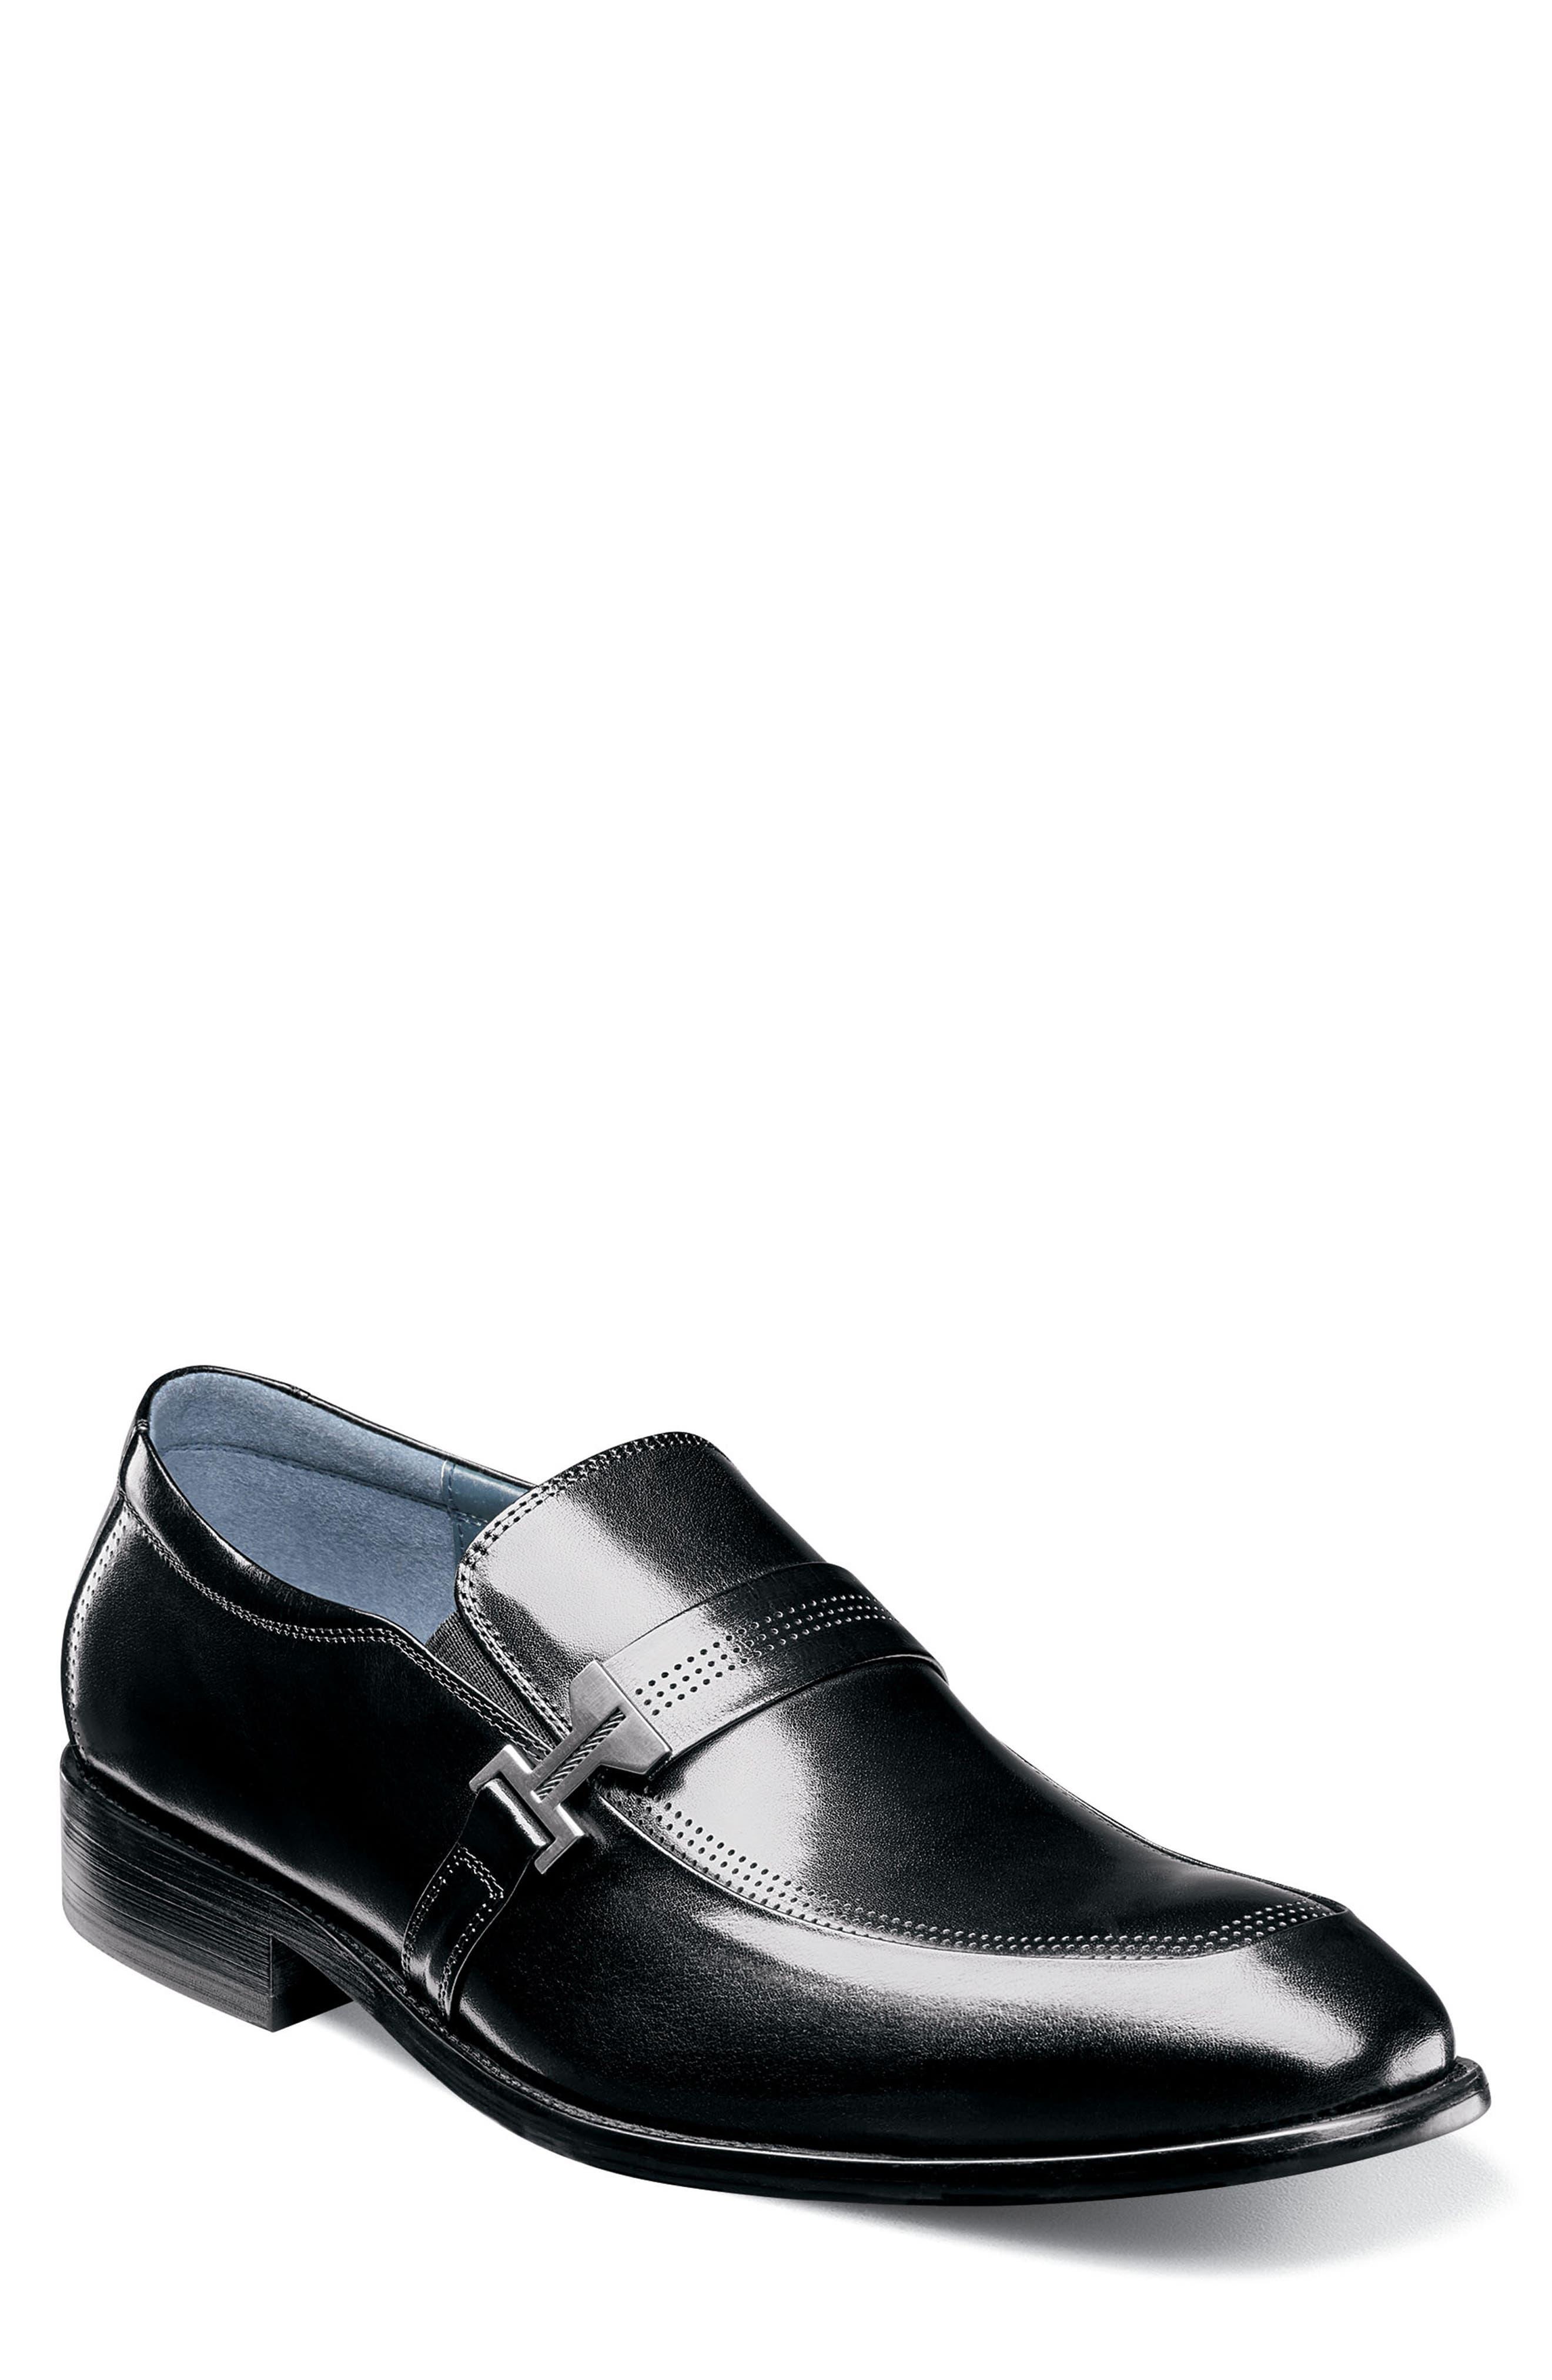 Jonas Apron Toe Slip-On,                         Main,                         color, BLACK LEATHER